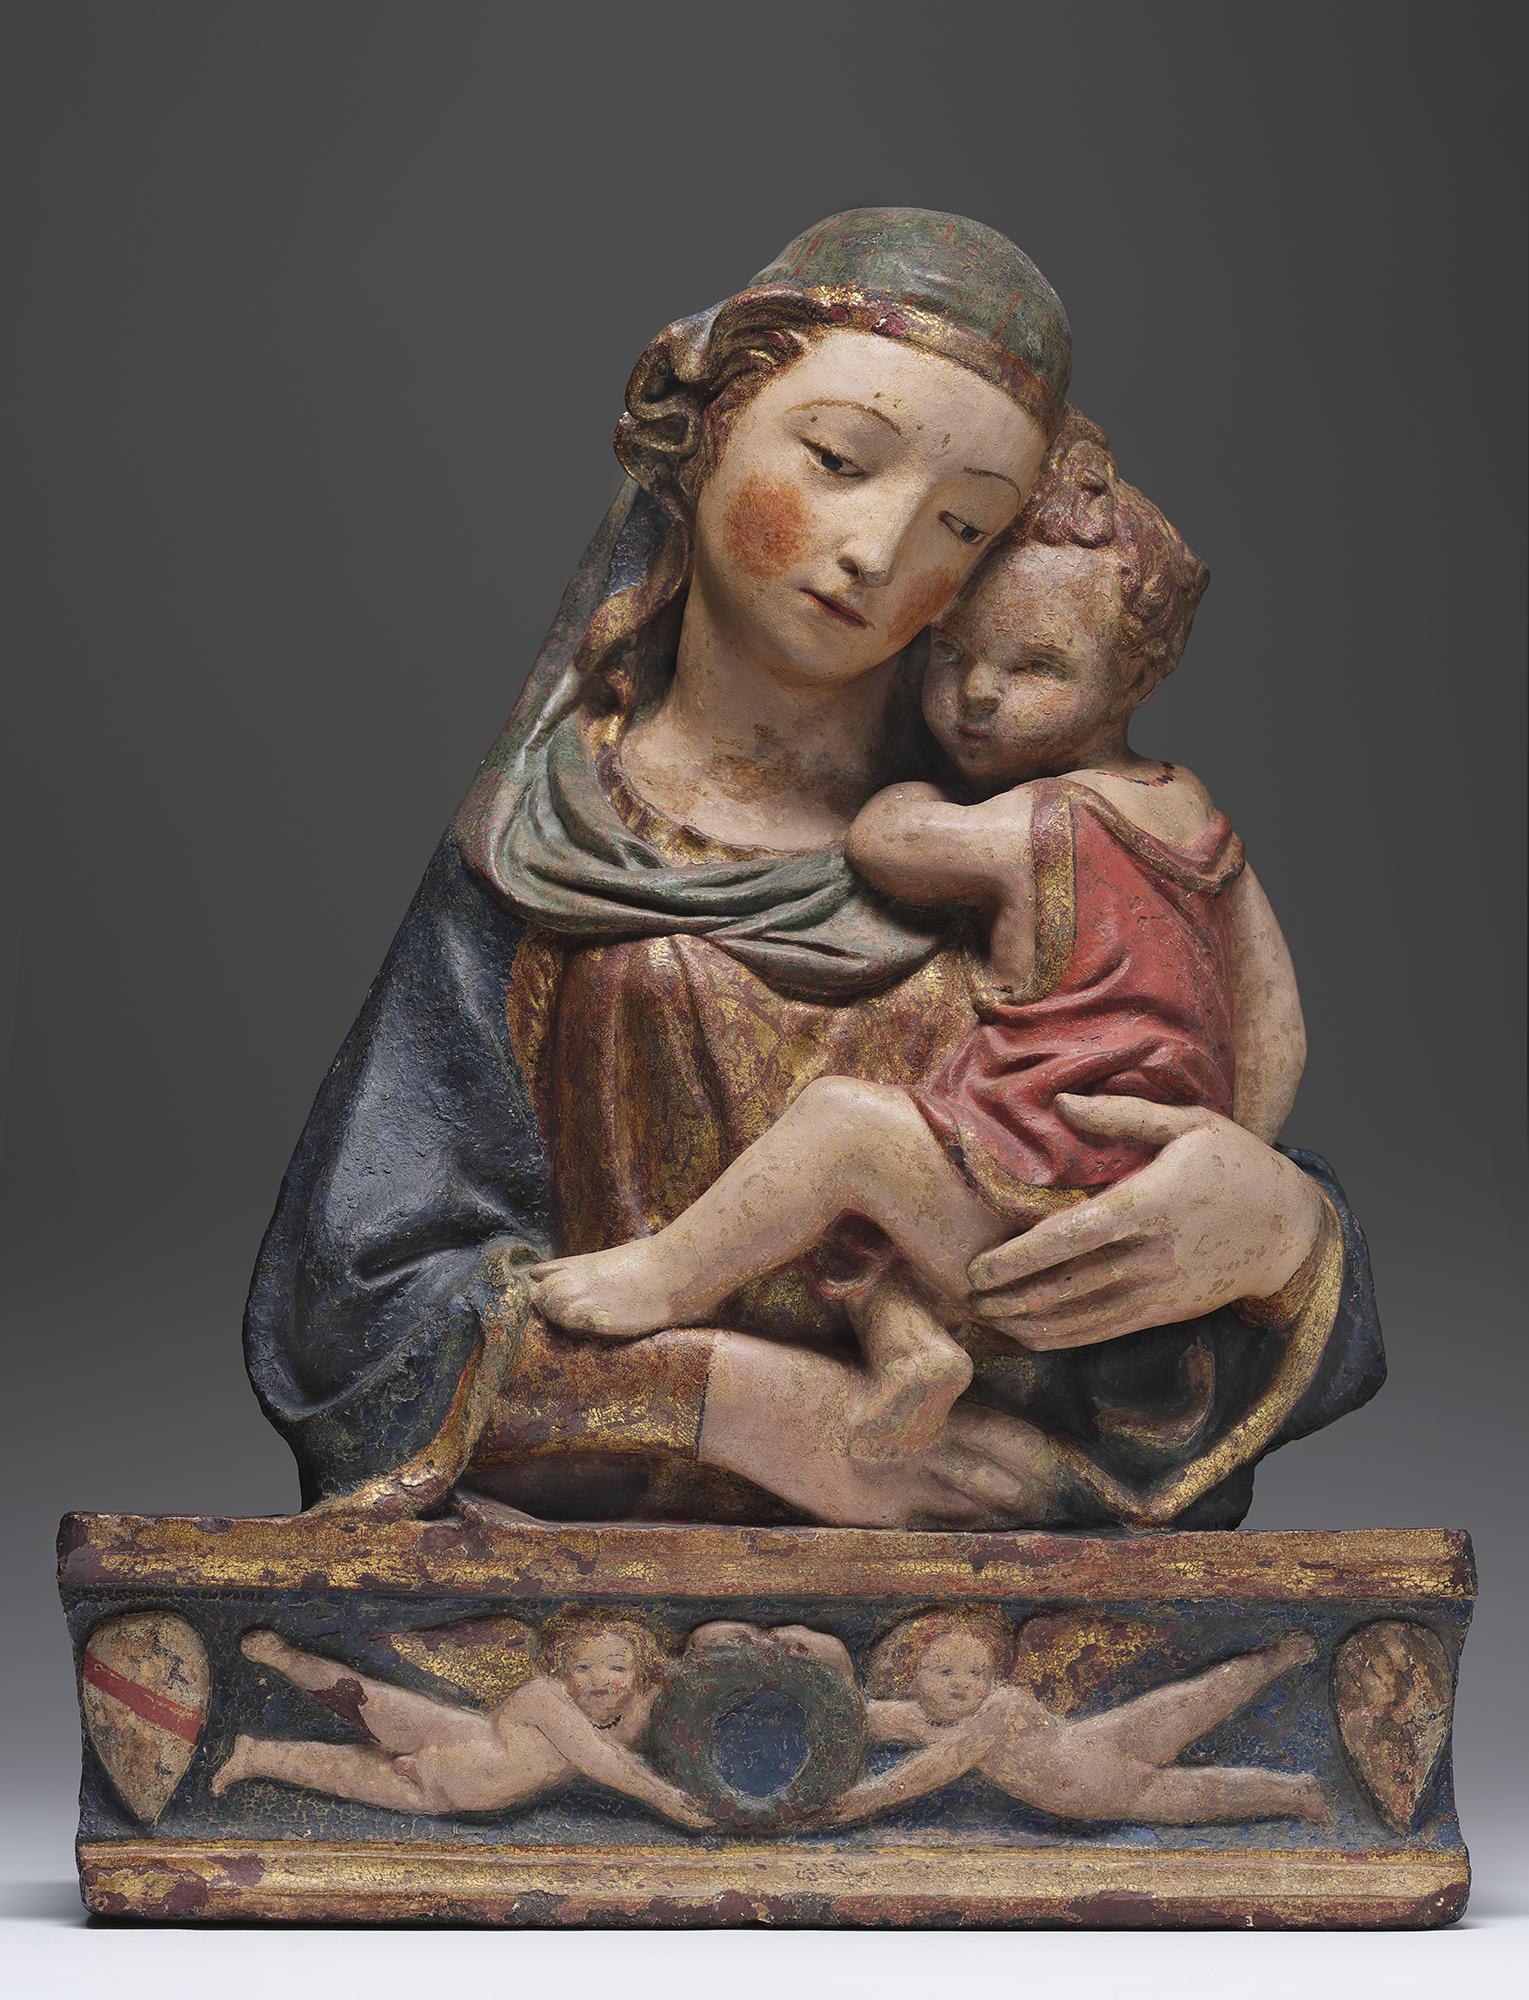 Workshop of Lorenzo Ghiberti (Italian, about 1381-1455), Virgin and Child, 1425-1450